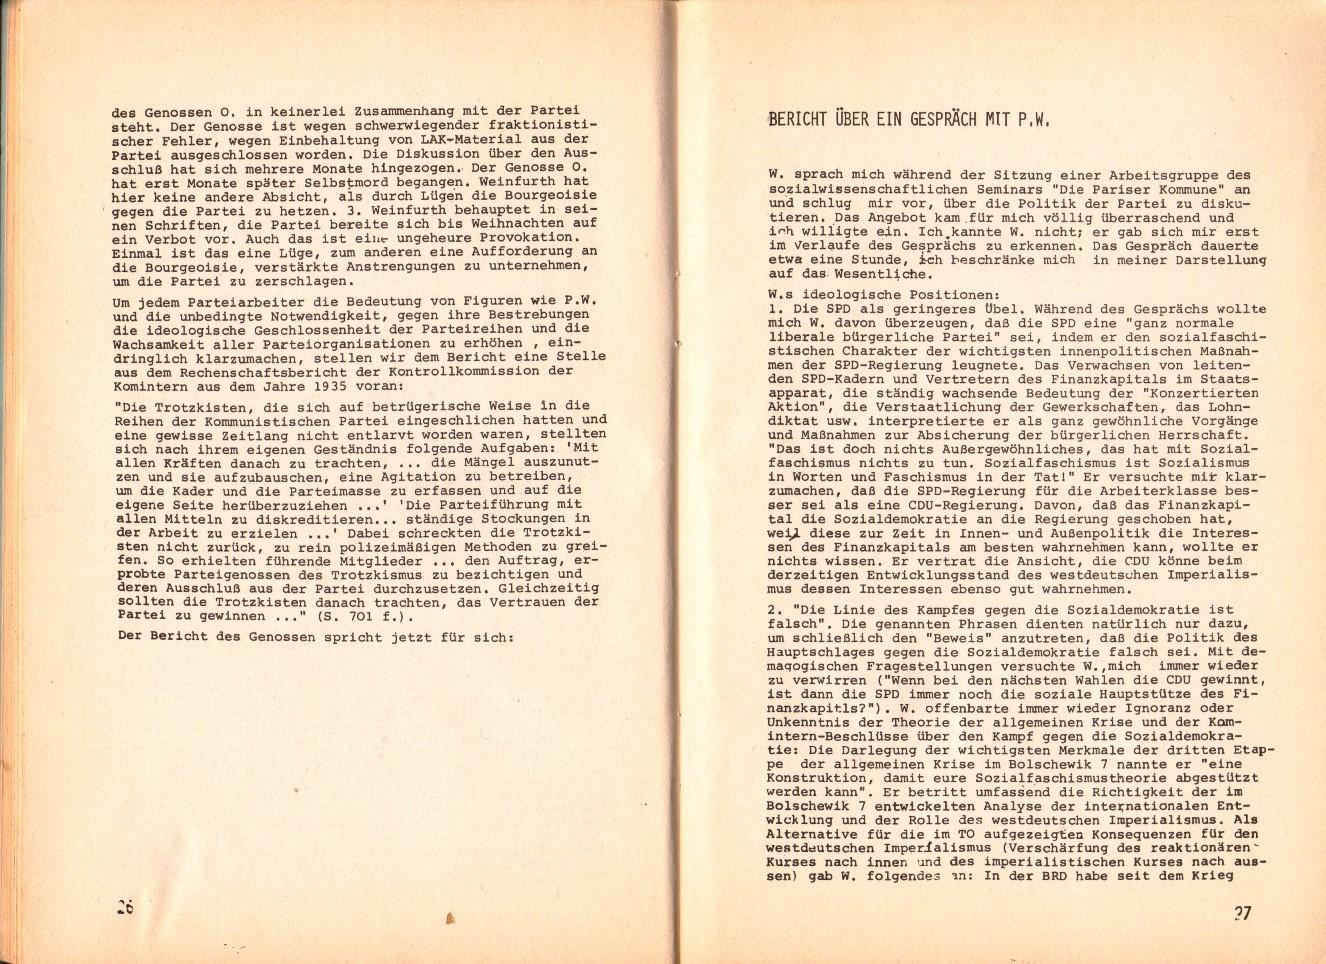 ZB_Parteiarbeiter_1971_10_15